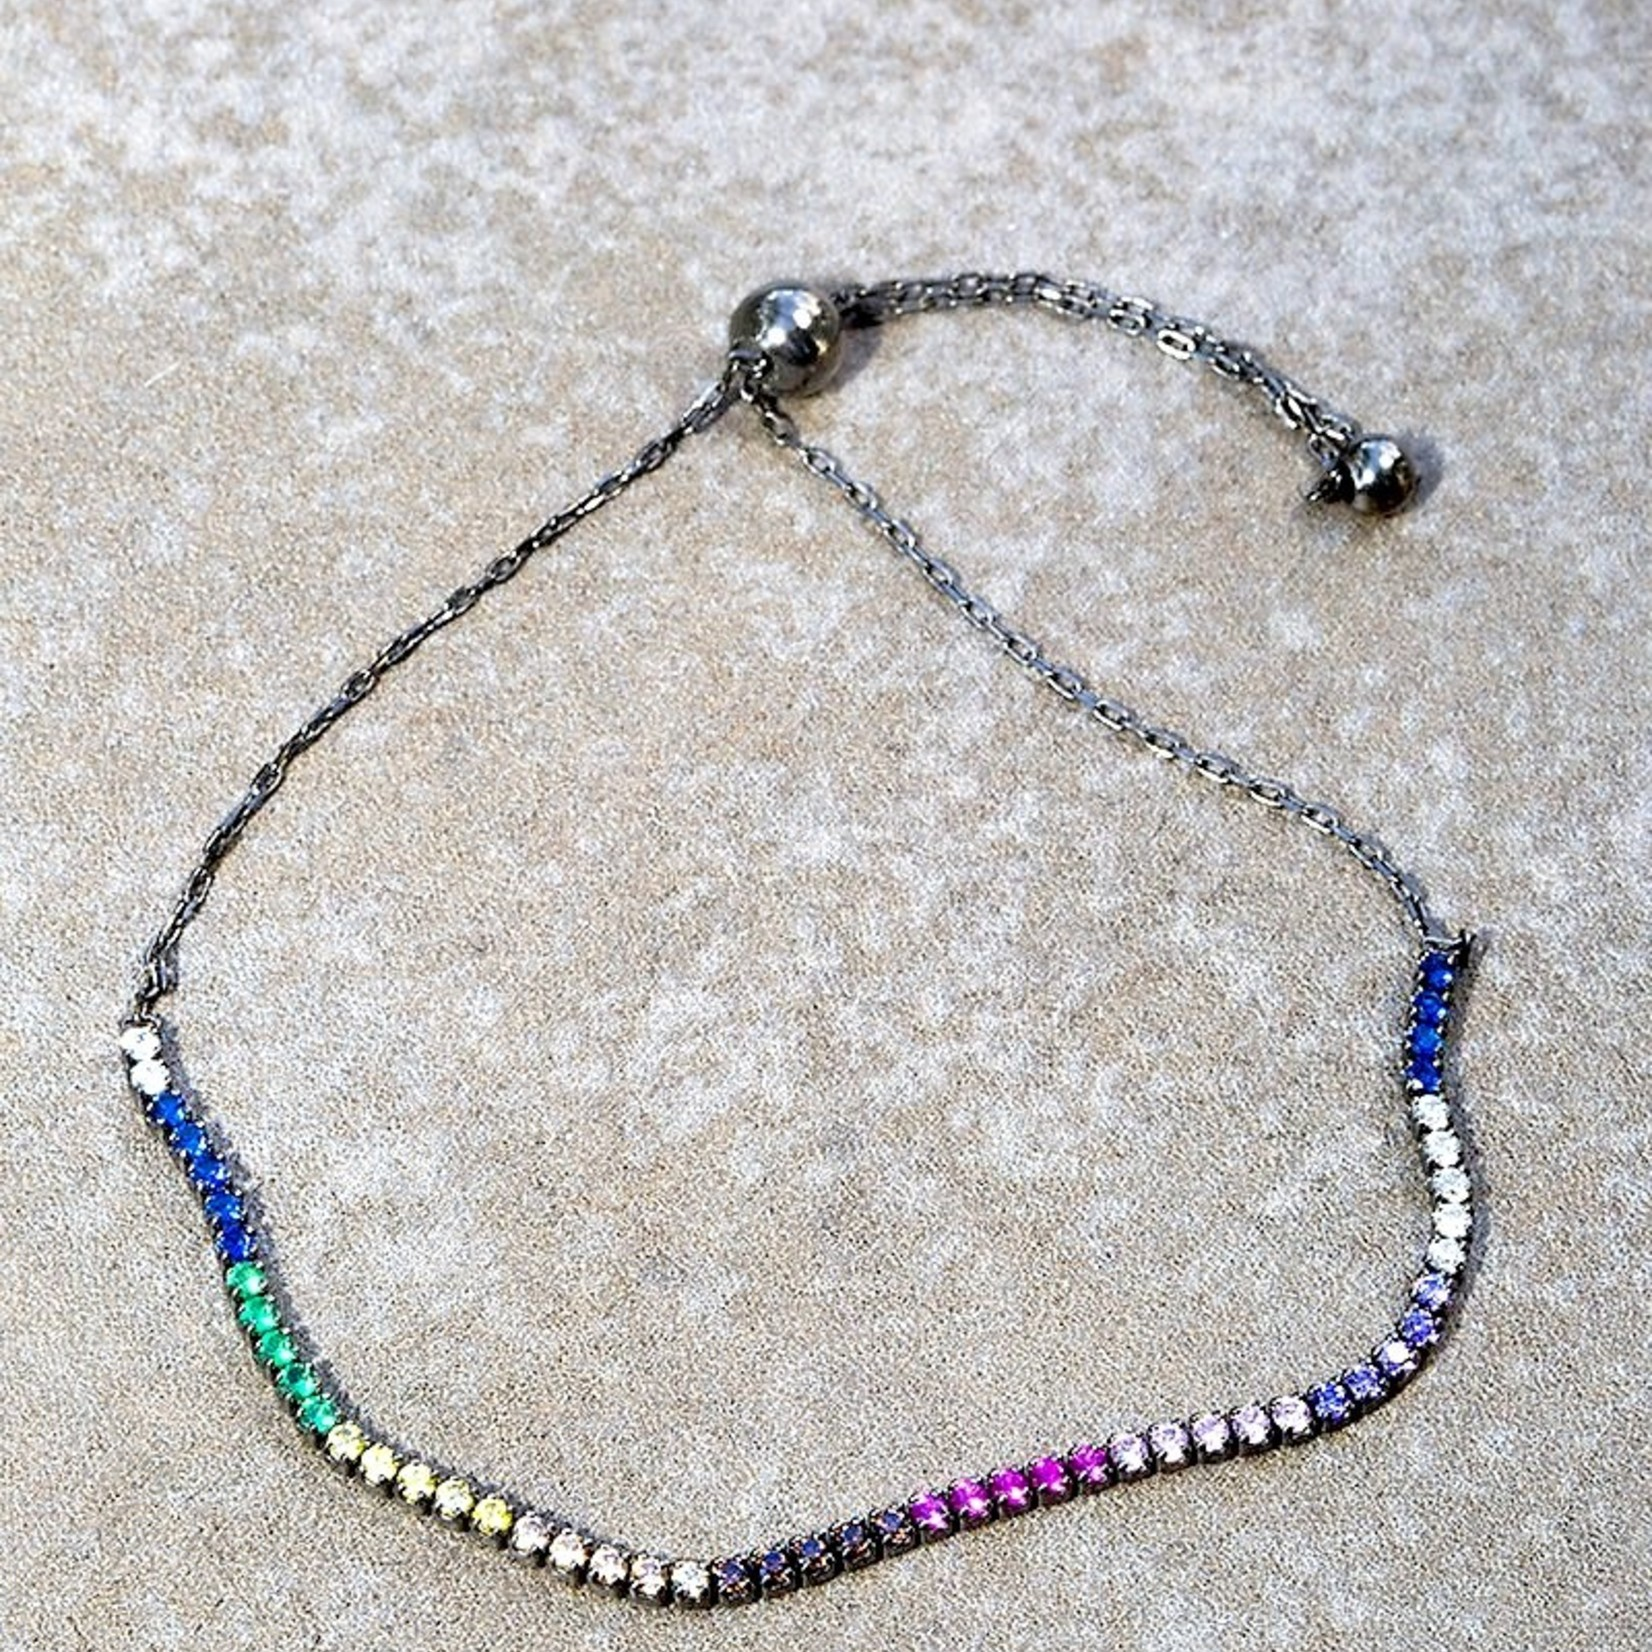 Native Gems PRISMATIC bracelet in black rhodium with multi colored CZ, adjustable